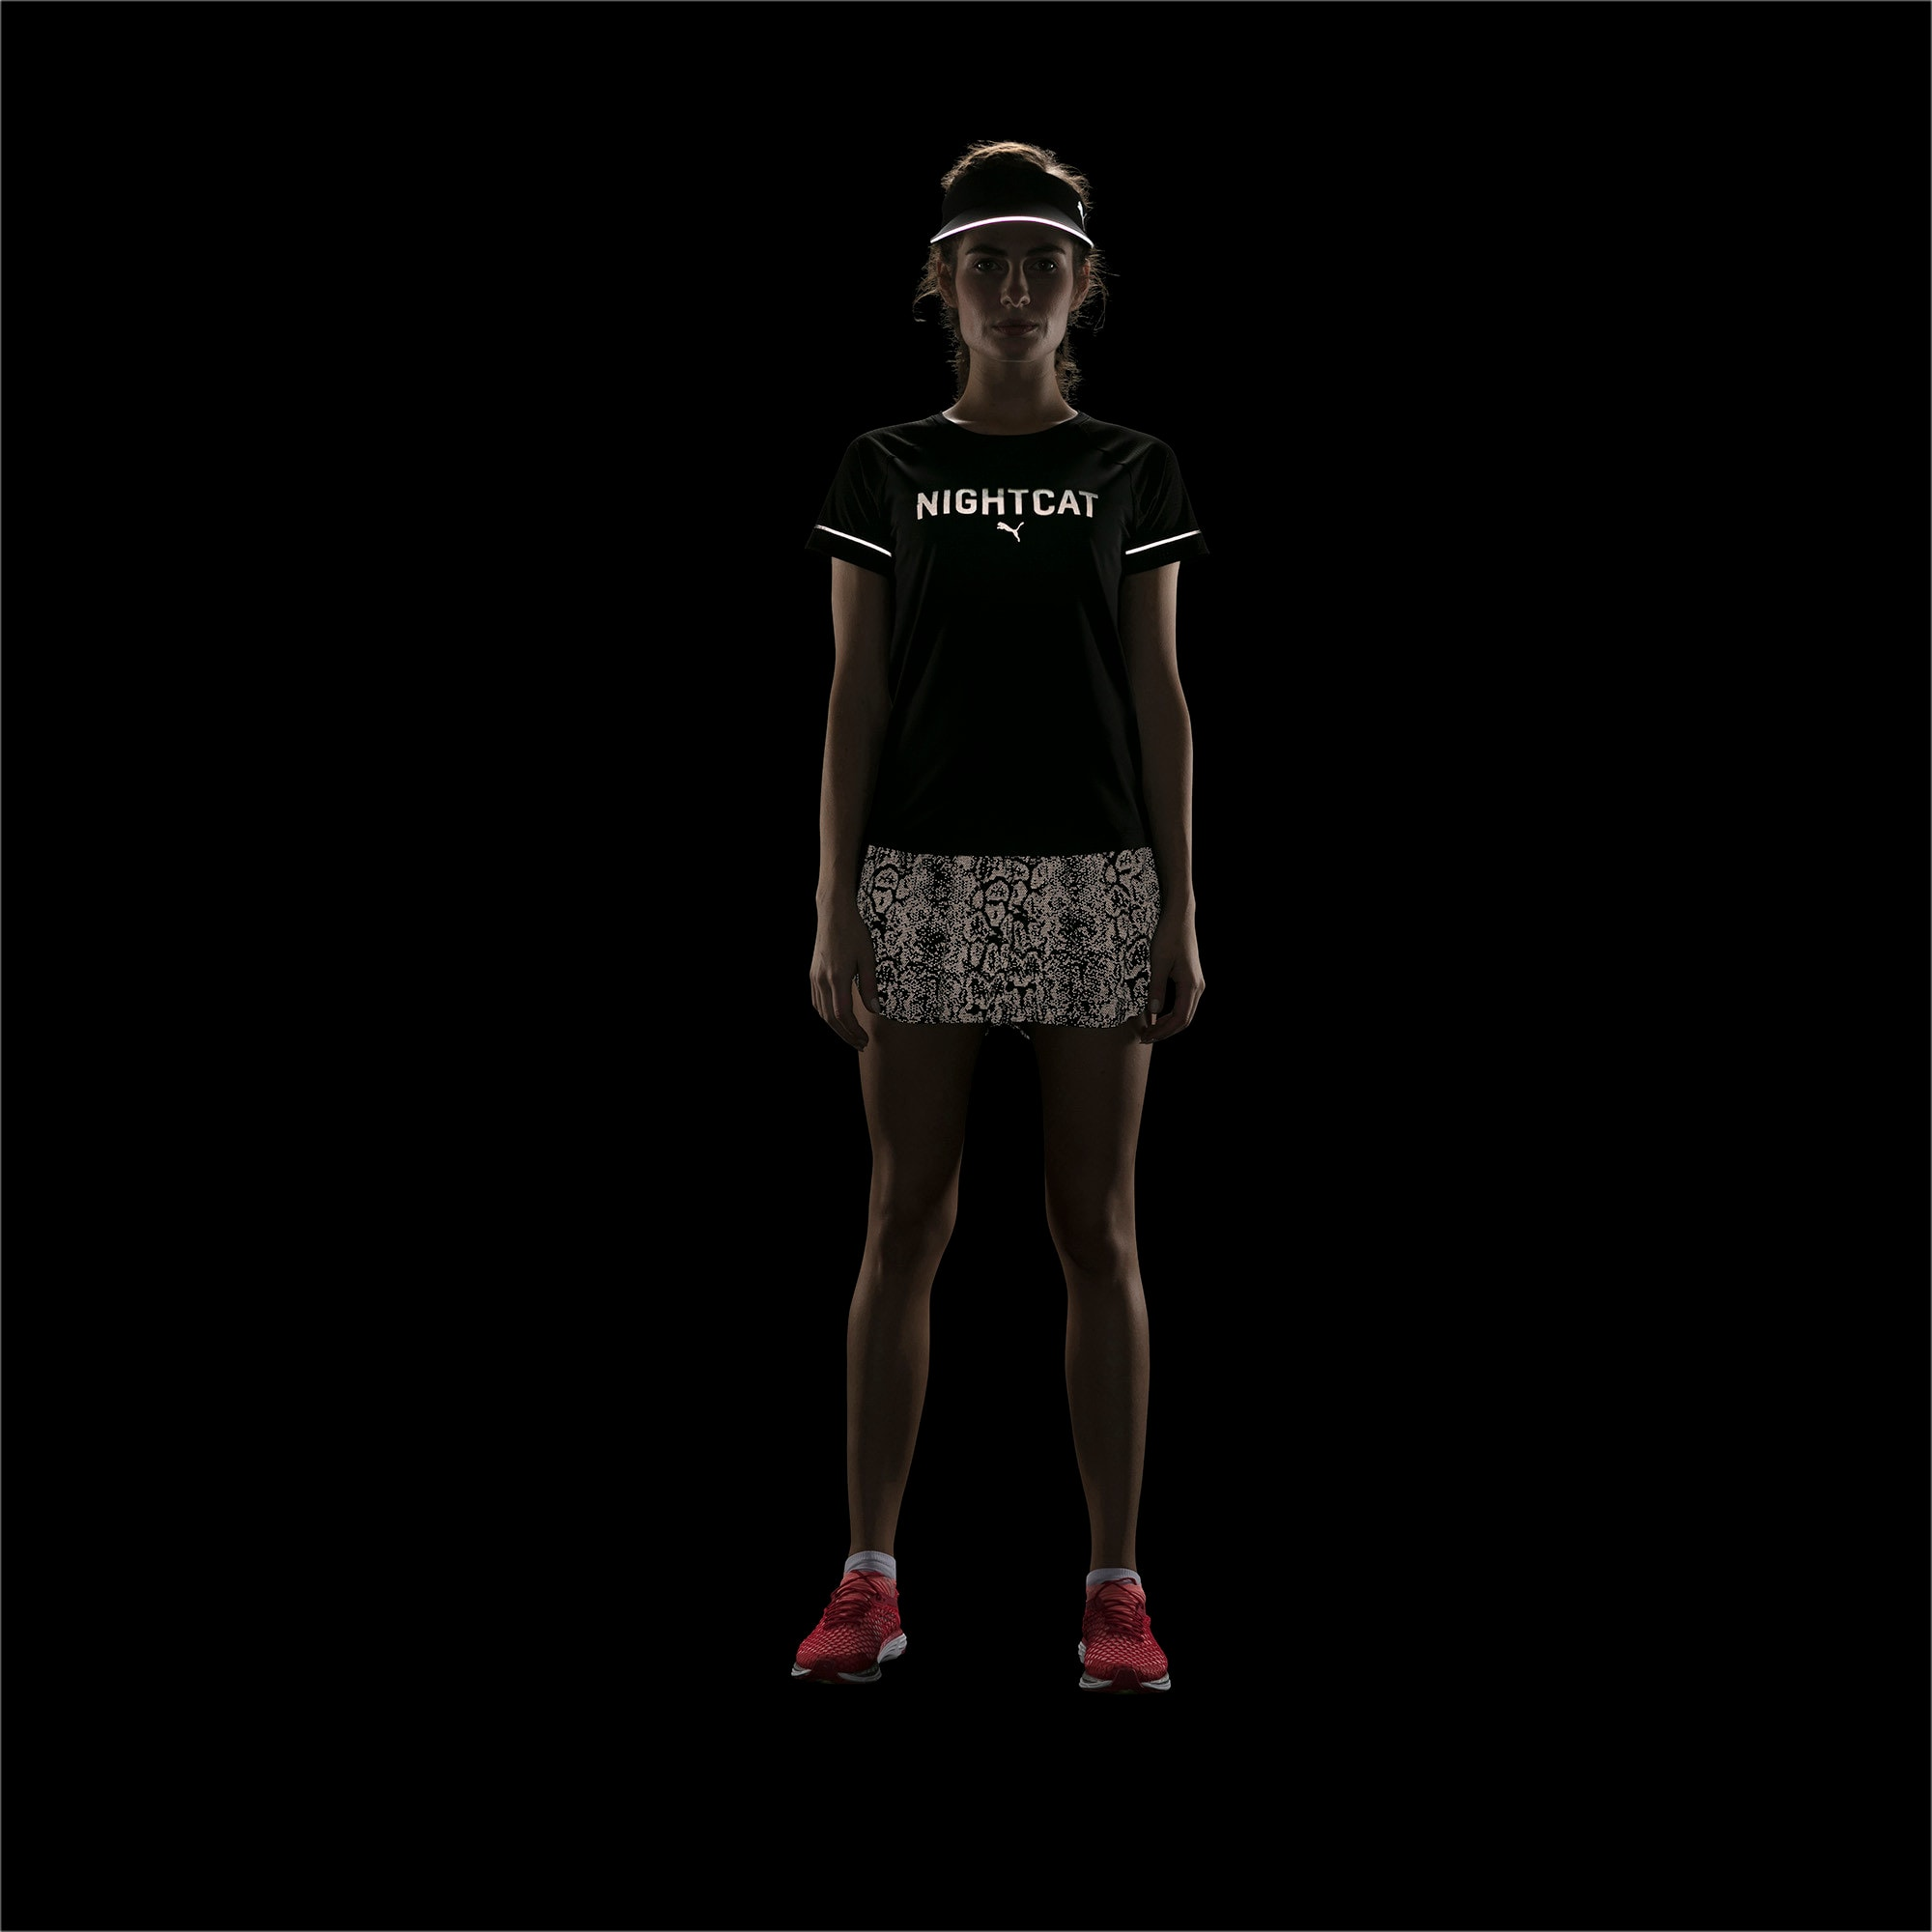 Thumbnail 5 of NightCat Women's Short Sleeve T-Shirt, Puma Black, medium-IND